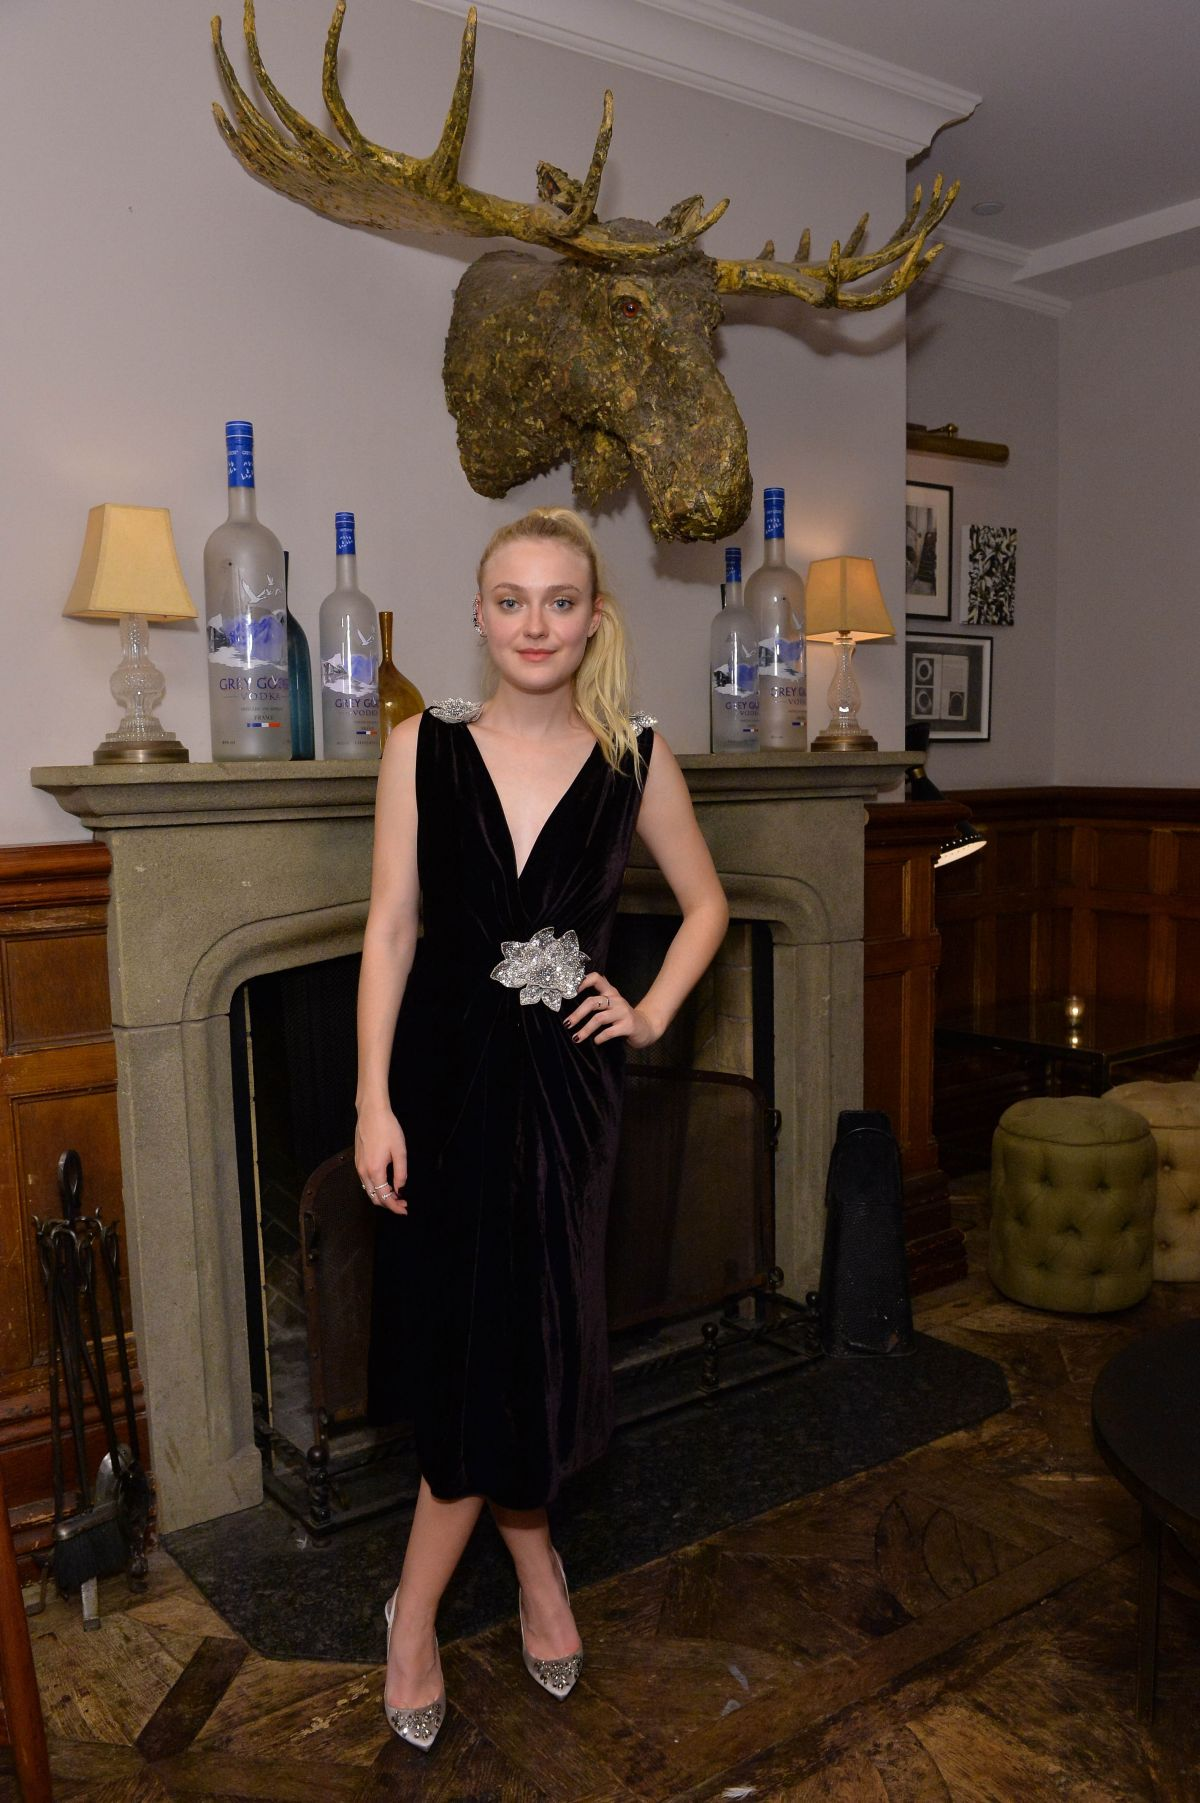 DAKOTA FANNING at Grey Goose Vodka and Soho House Party in Toronto 09/12/2016